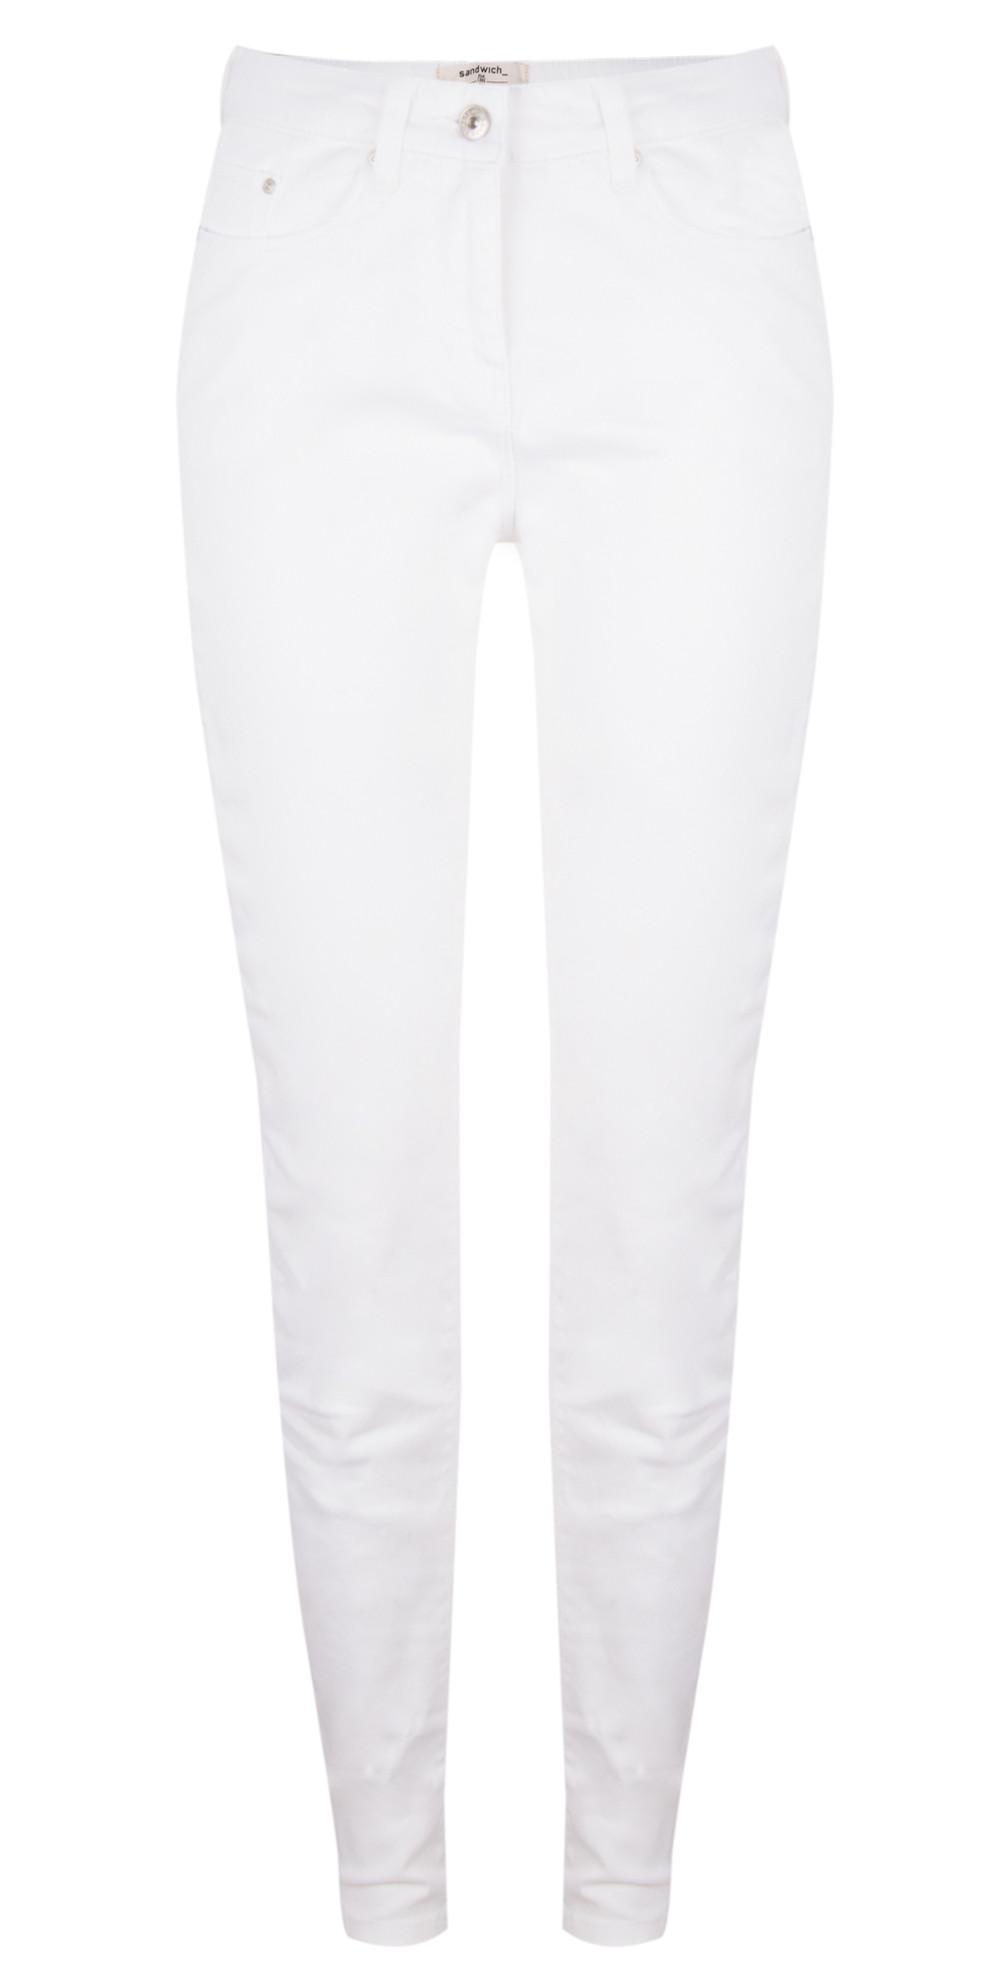 Essentials Skinny Pants main image